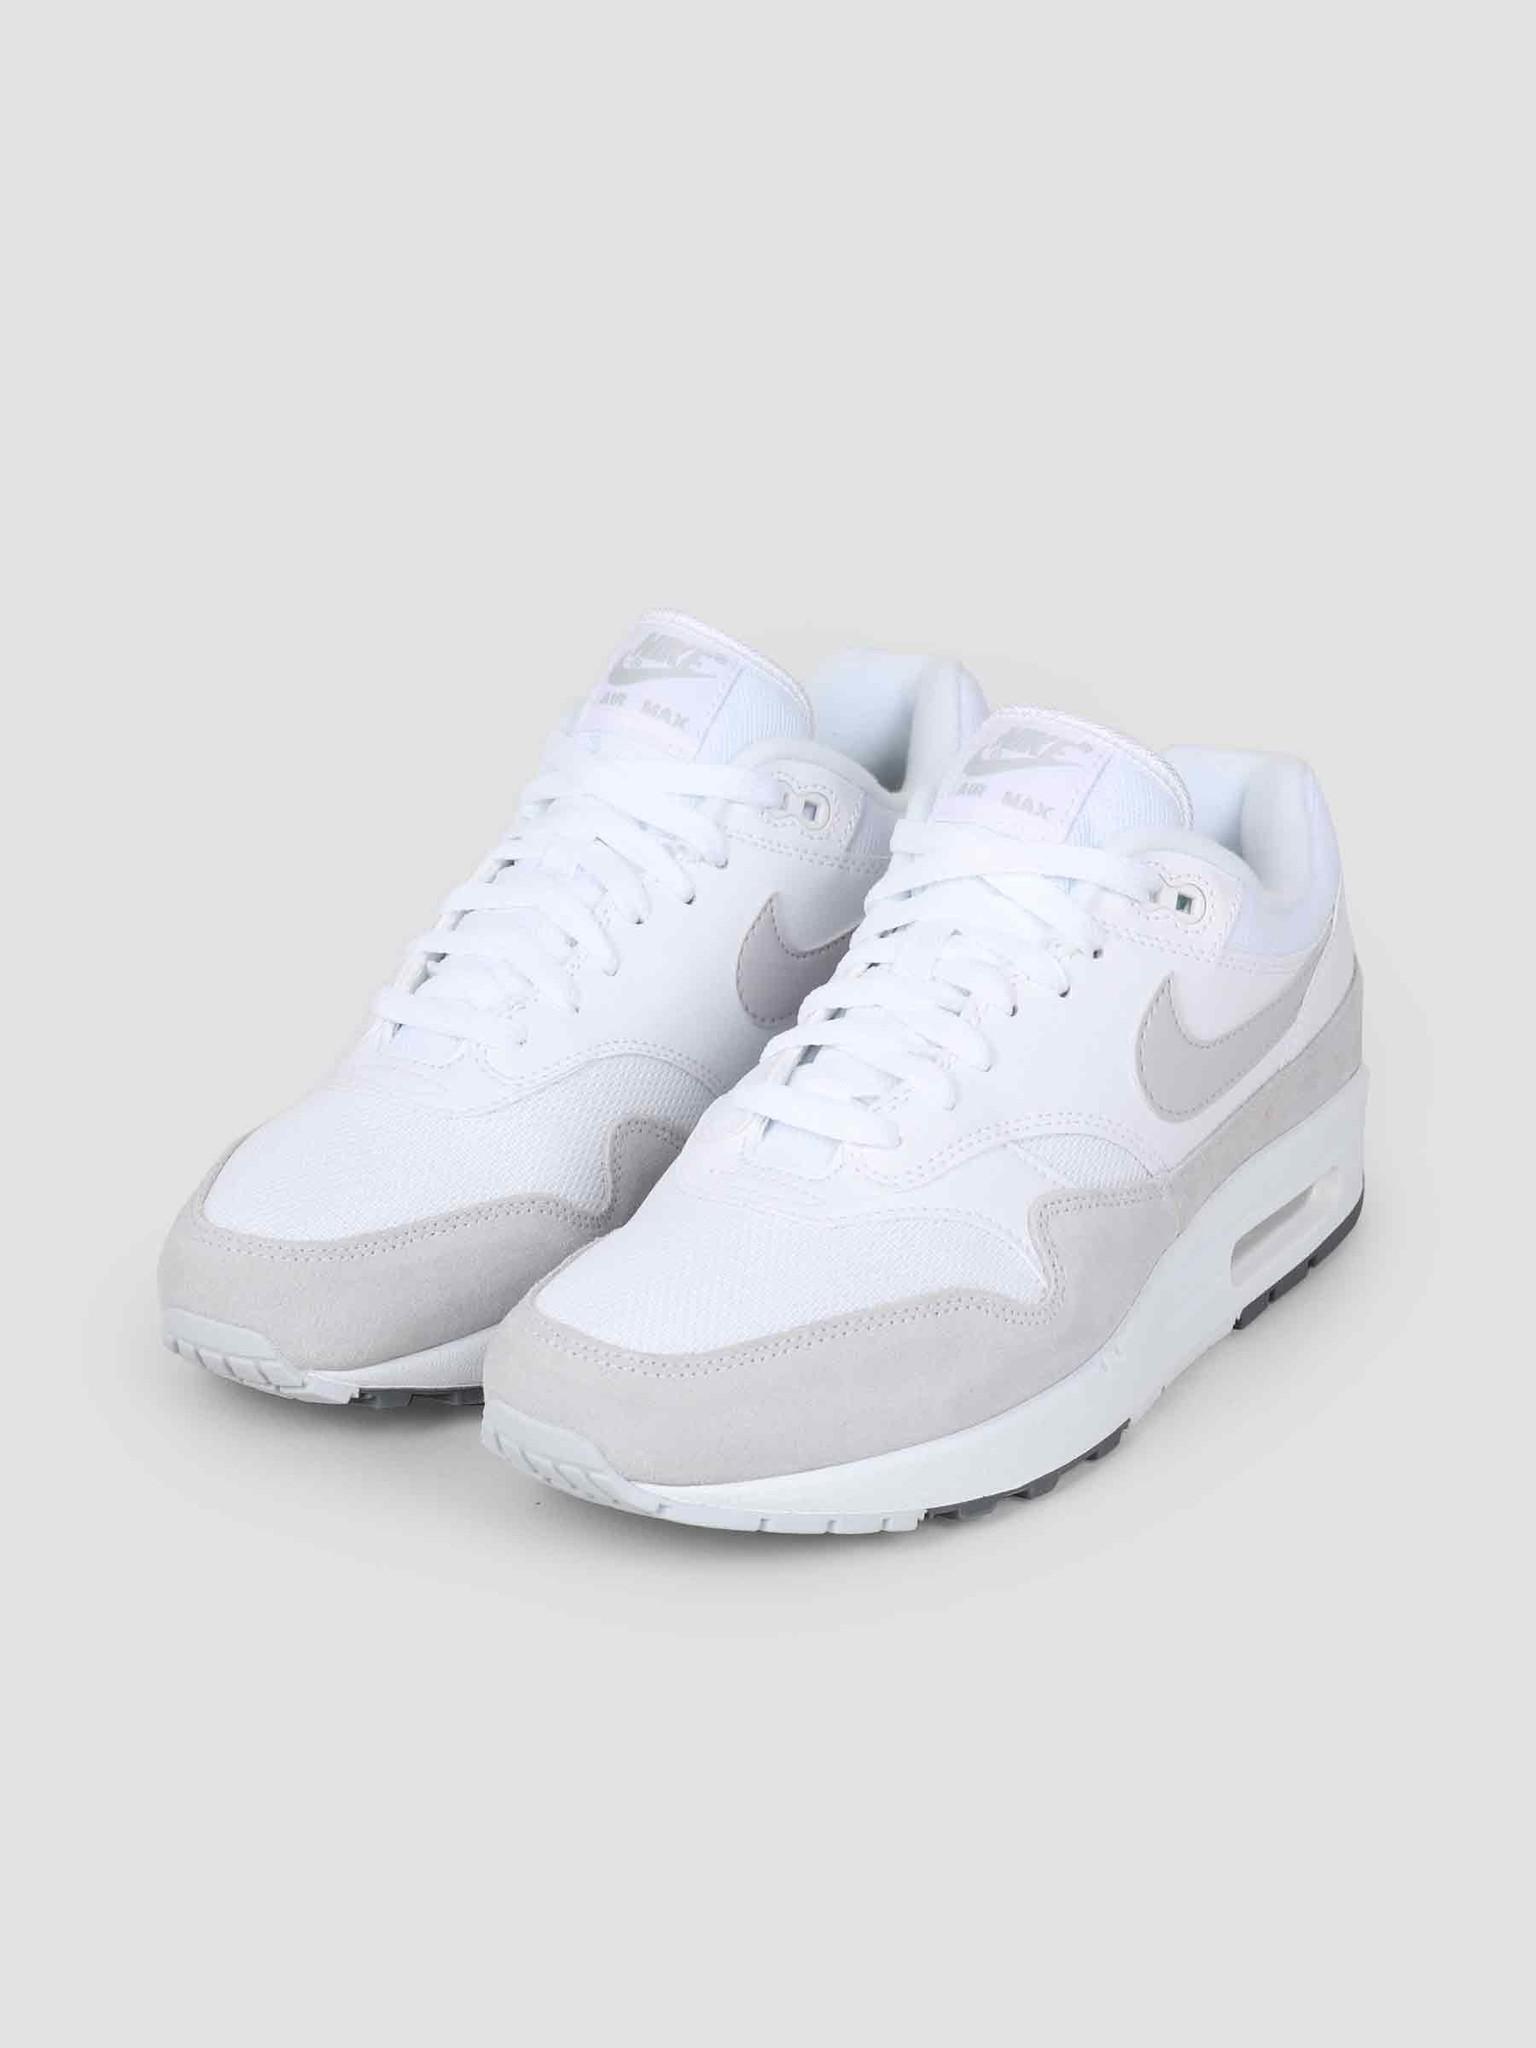 online retailer f00fe 57ccb Nike Nike Air Max 1 Shoe White Pure Platinum Cool Grey AH8145-110